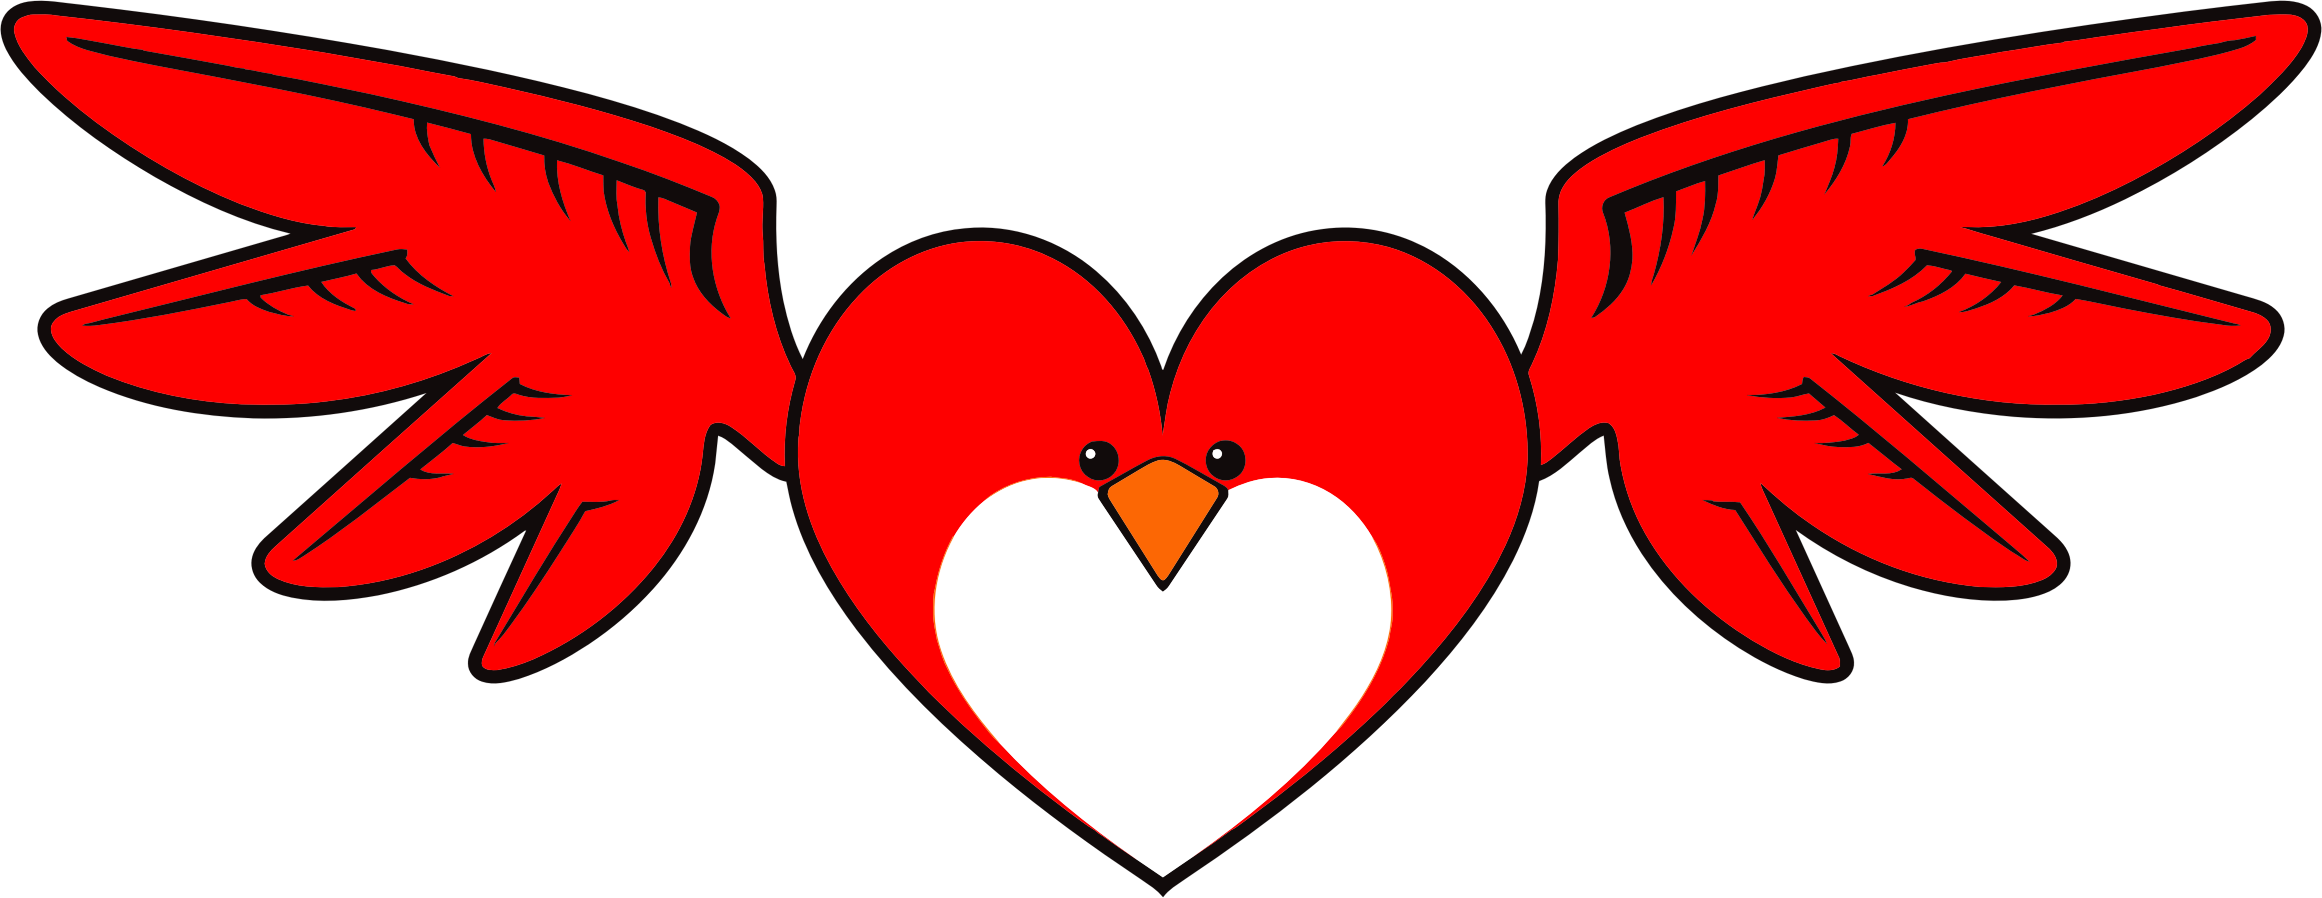 Heart. Hearts clipart bird